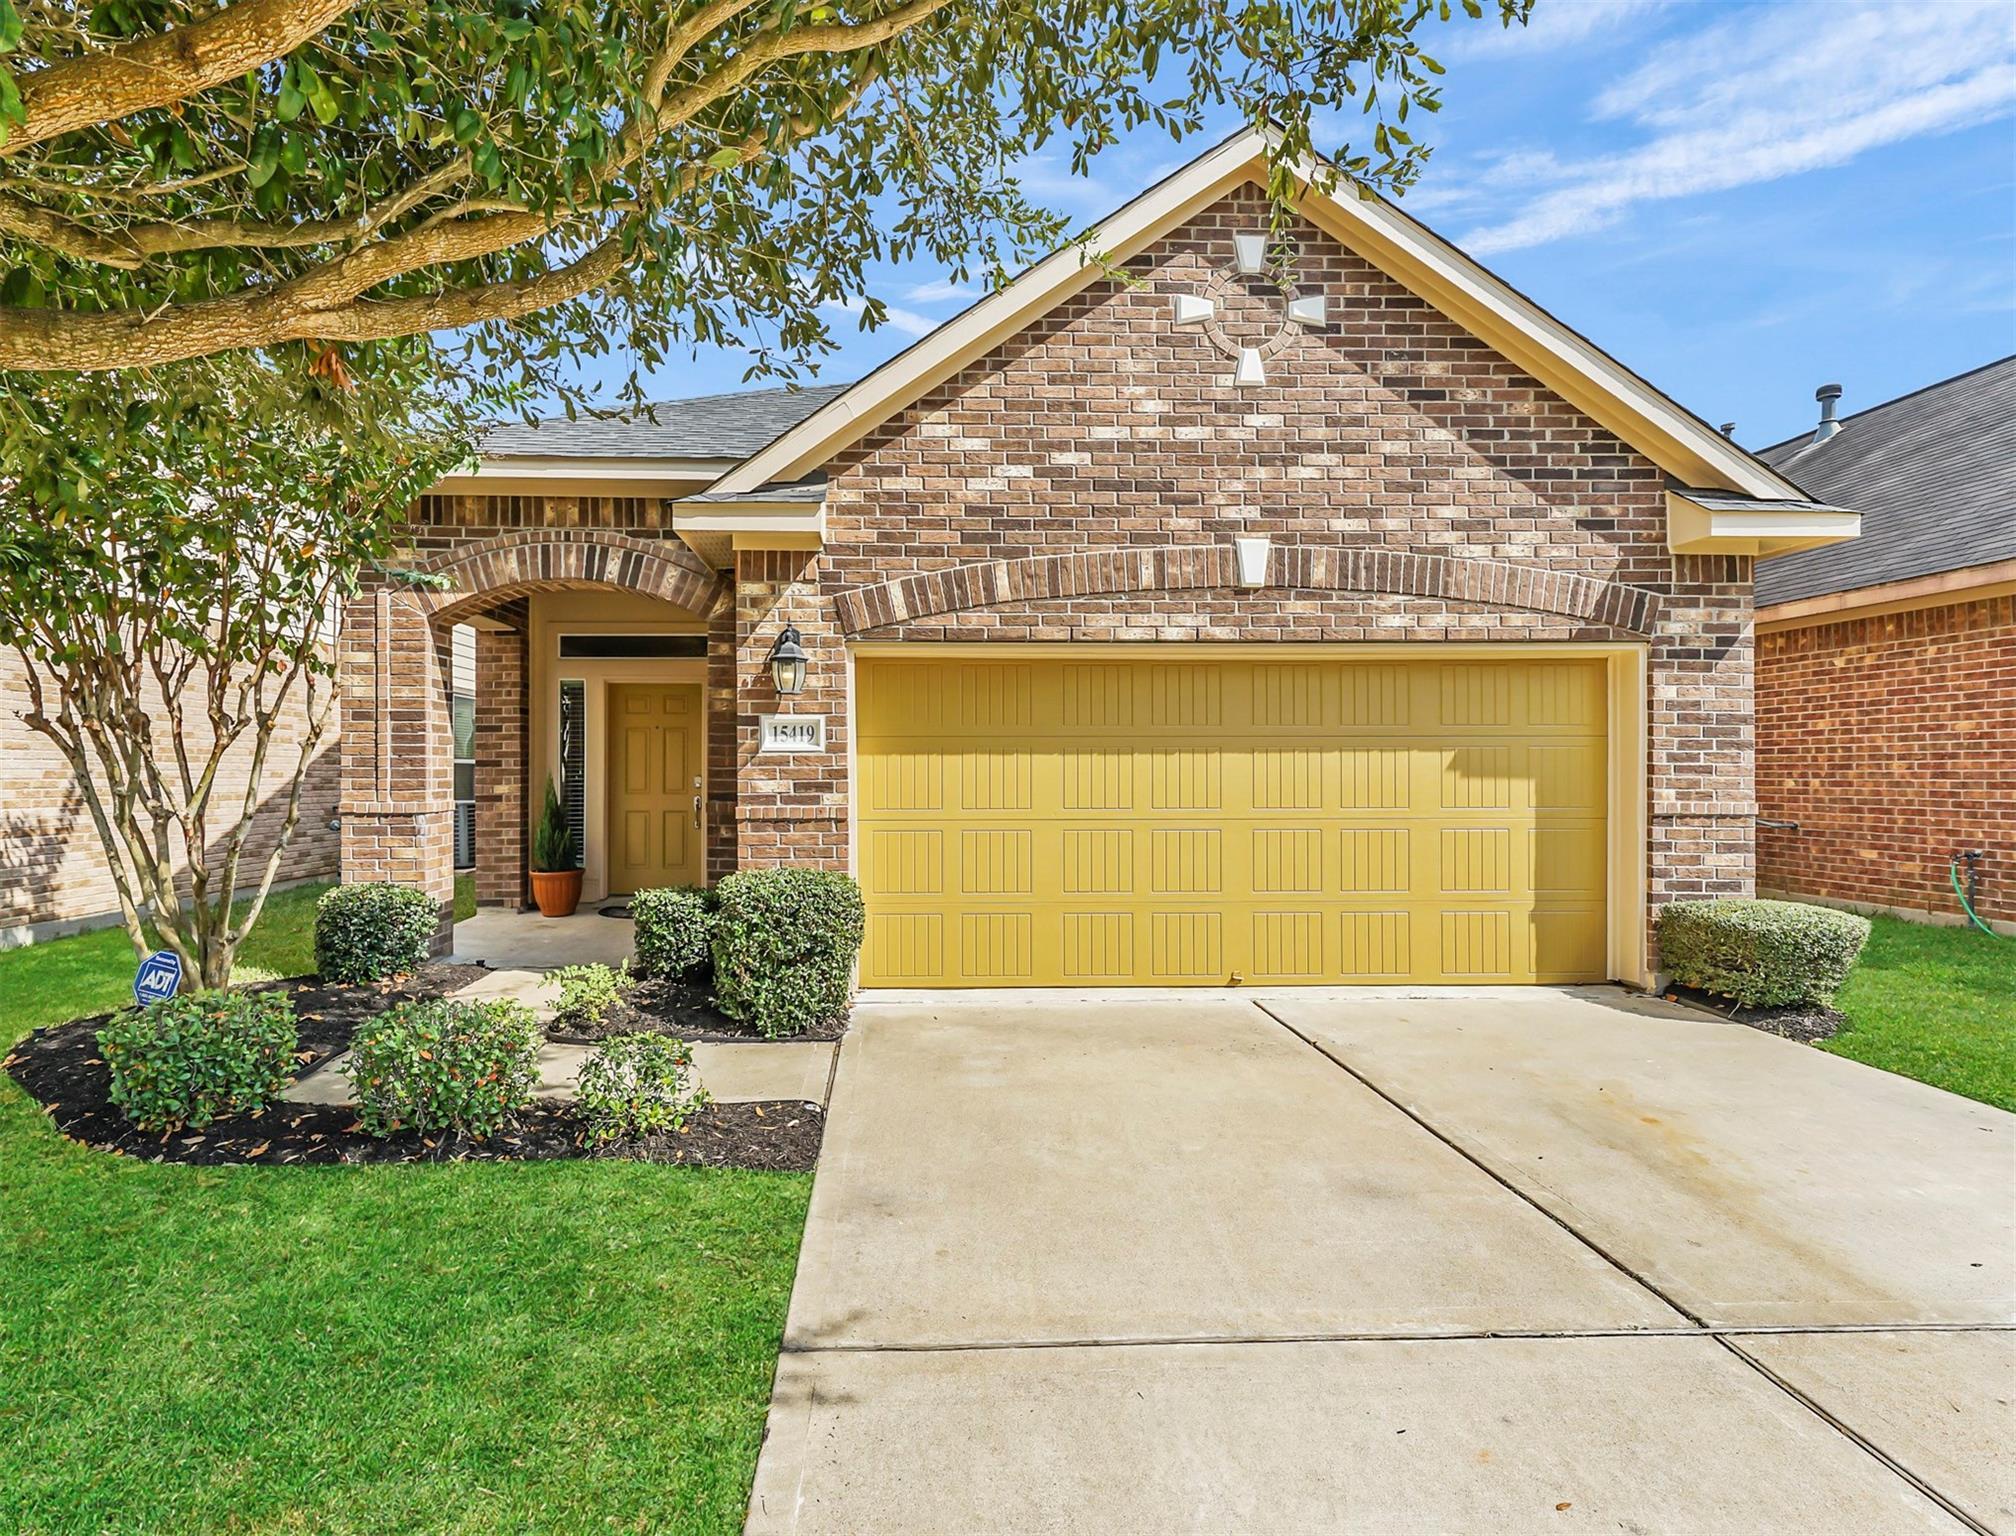 15419 Hinsdale Springs Lane Property Photo - Houston, TX real estate listing